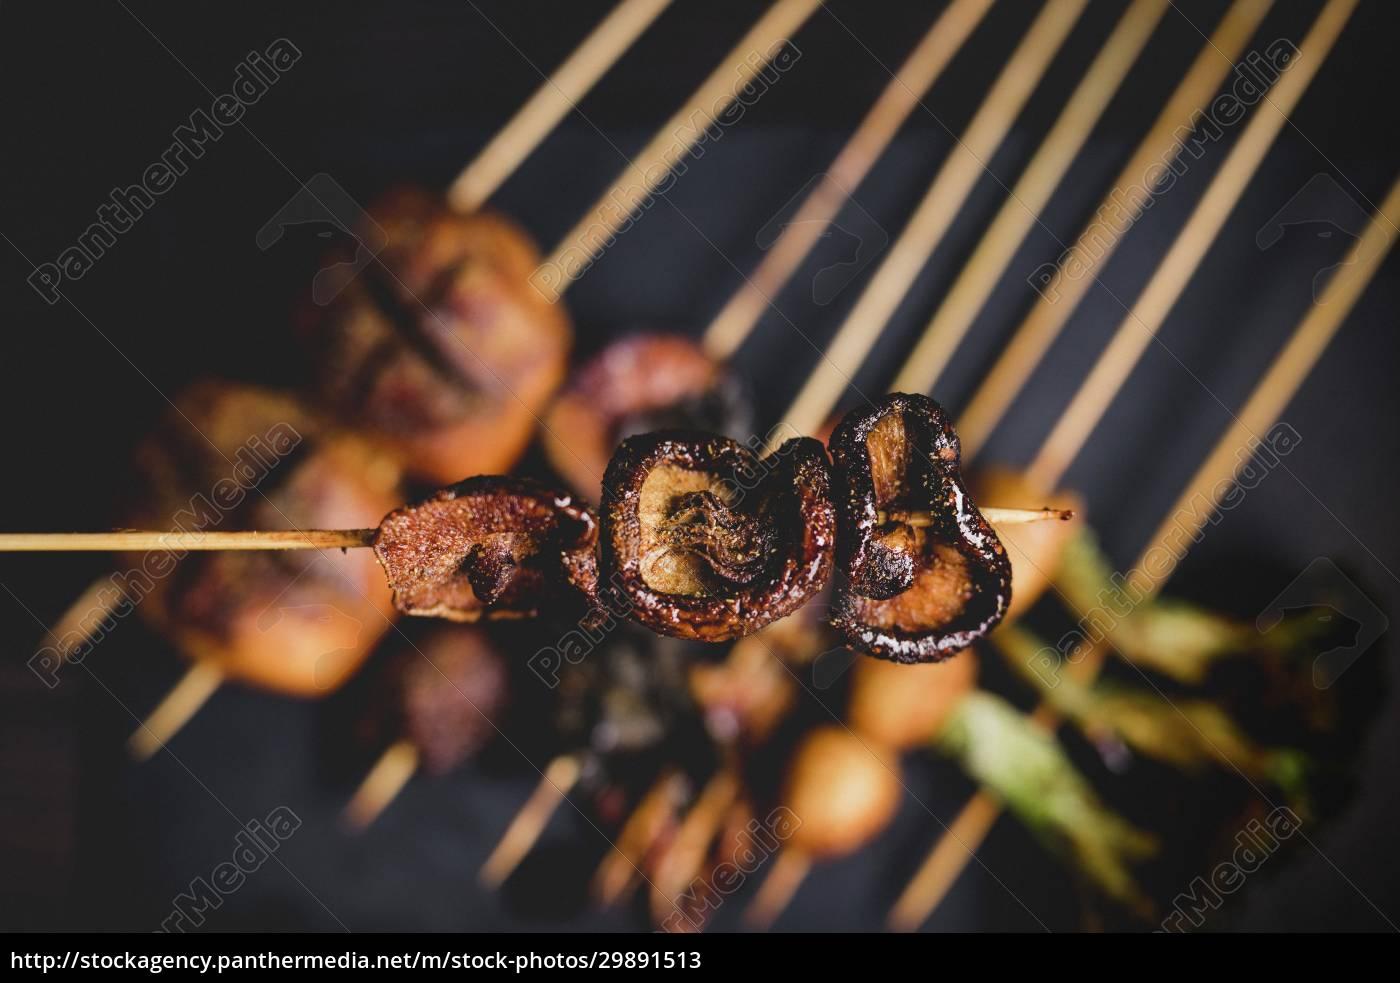 cooked, hot, mushroom, skewer, over, table - 29891513